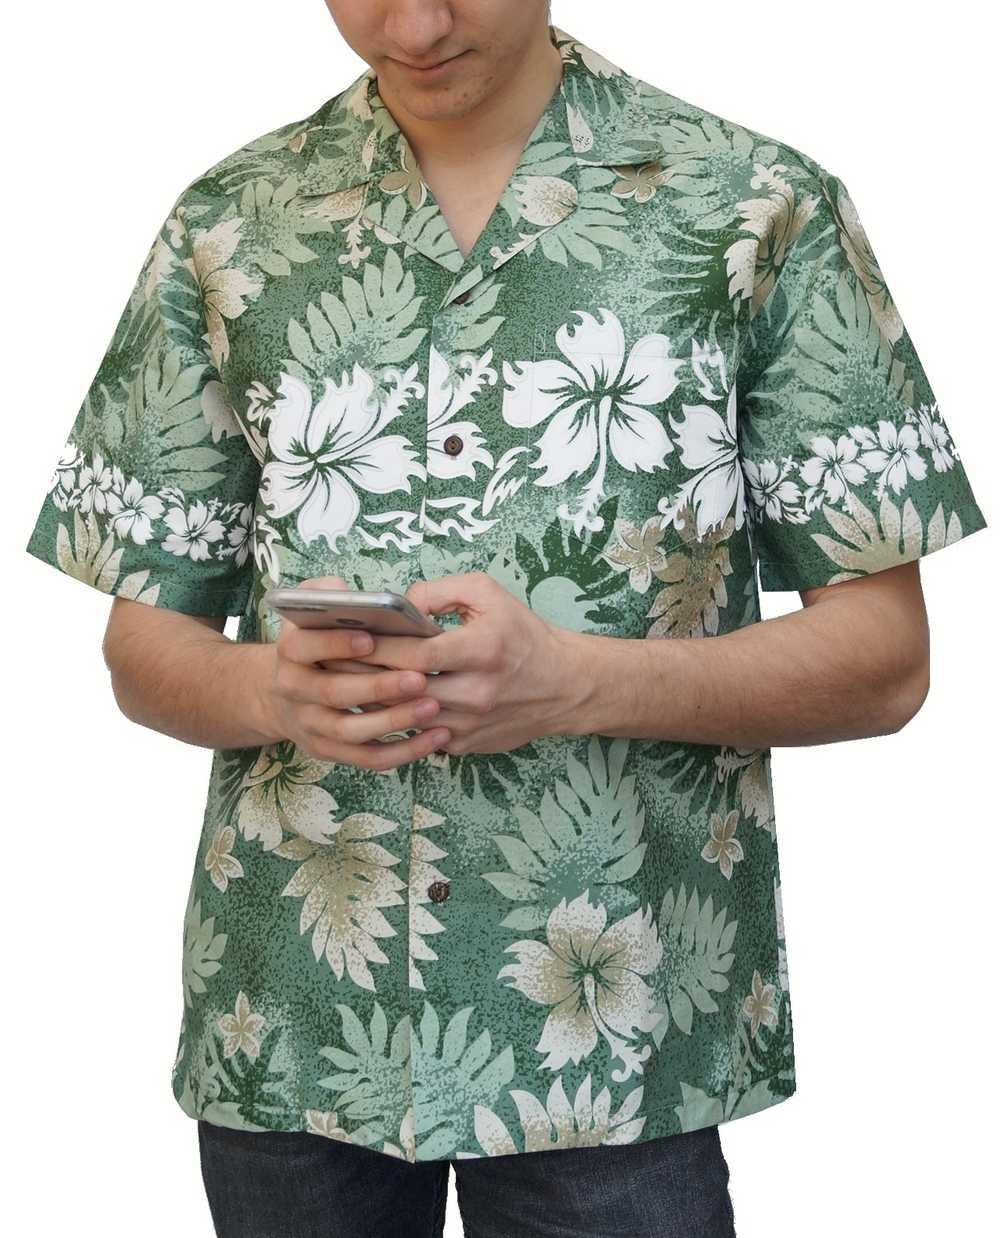 293278c2027 chemise hawaienne ... Hibiscus and fern vert. La chemise Hawaïenne à ...